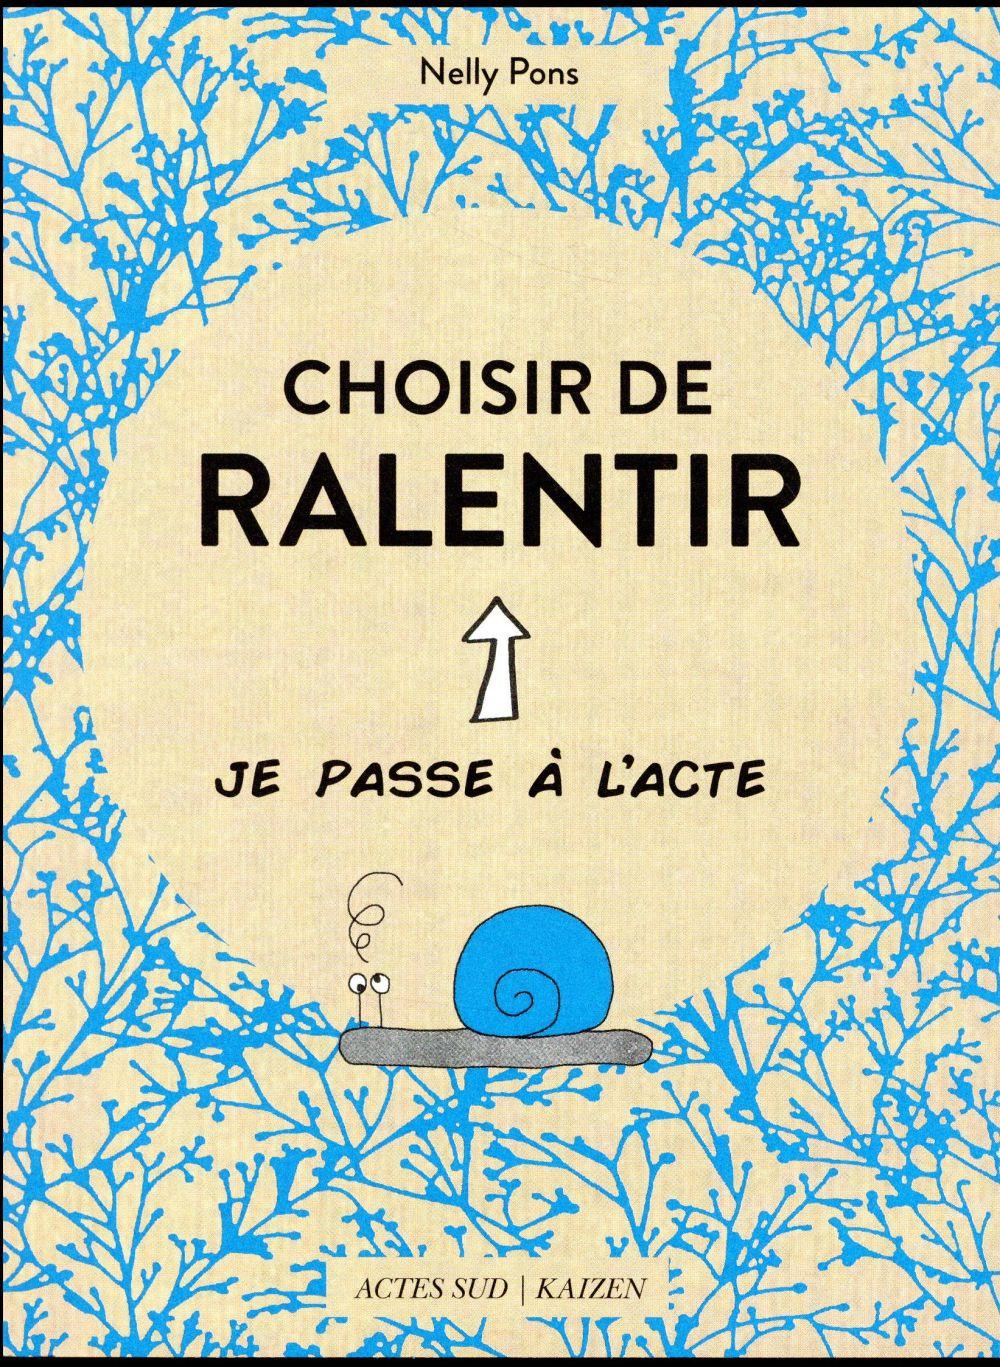 CHOISIR DE RALENTIR